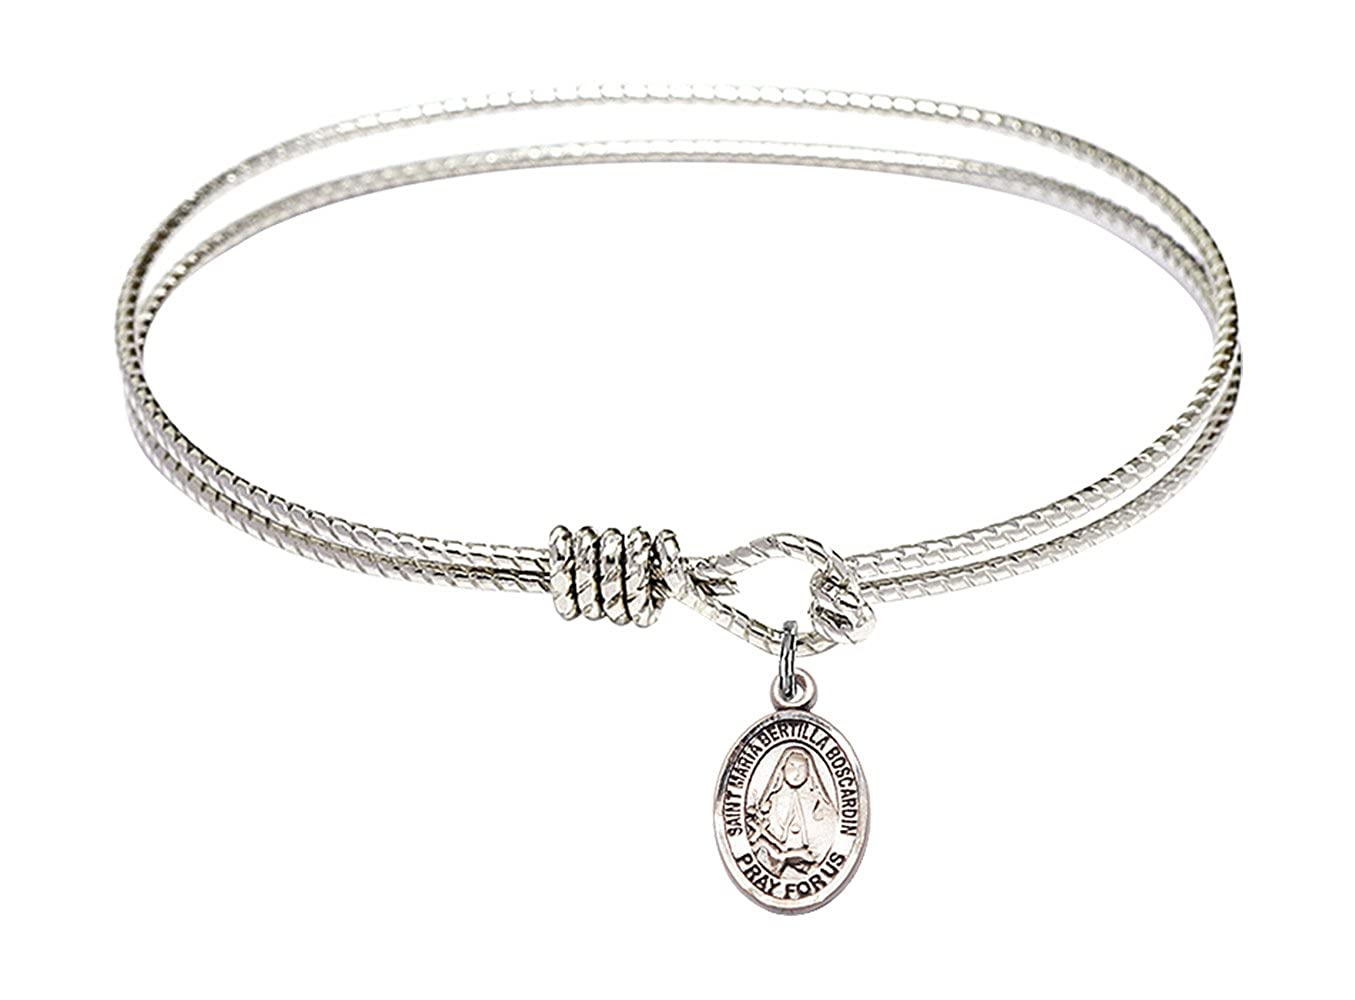 Maria Bertilla Boscardin charm. 7 1//4 inch Oval Eye Hook Bangle Bracelet with a St